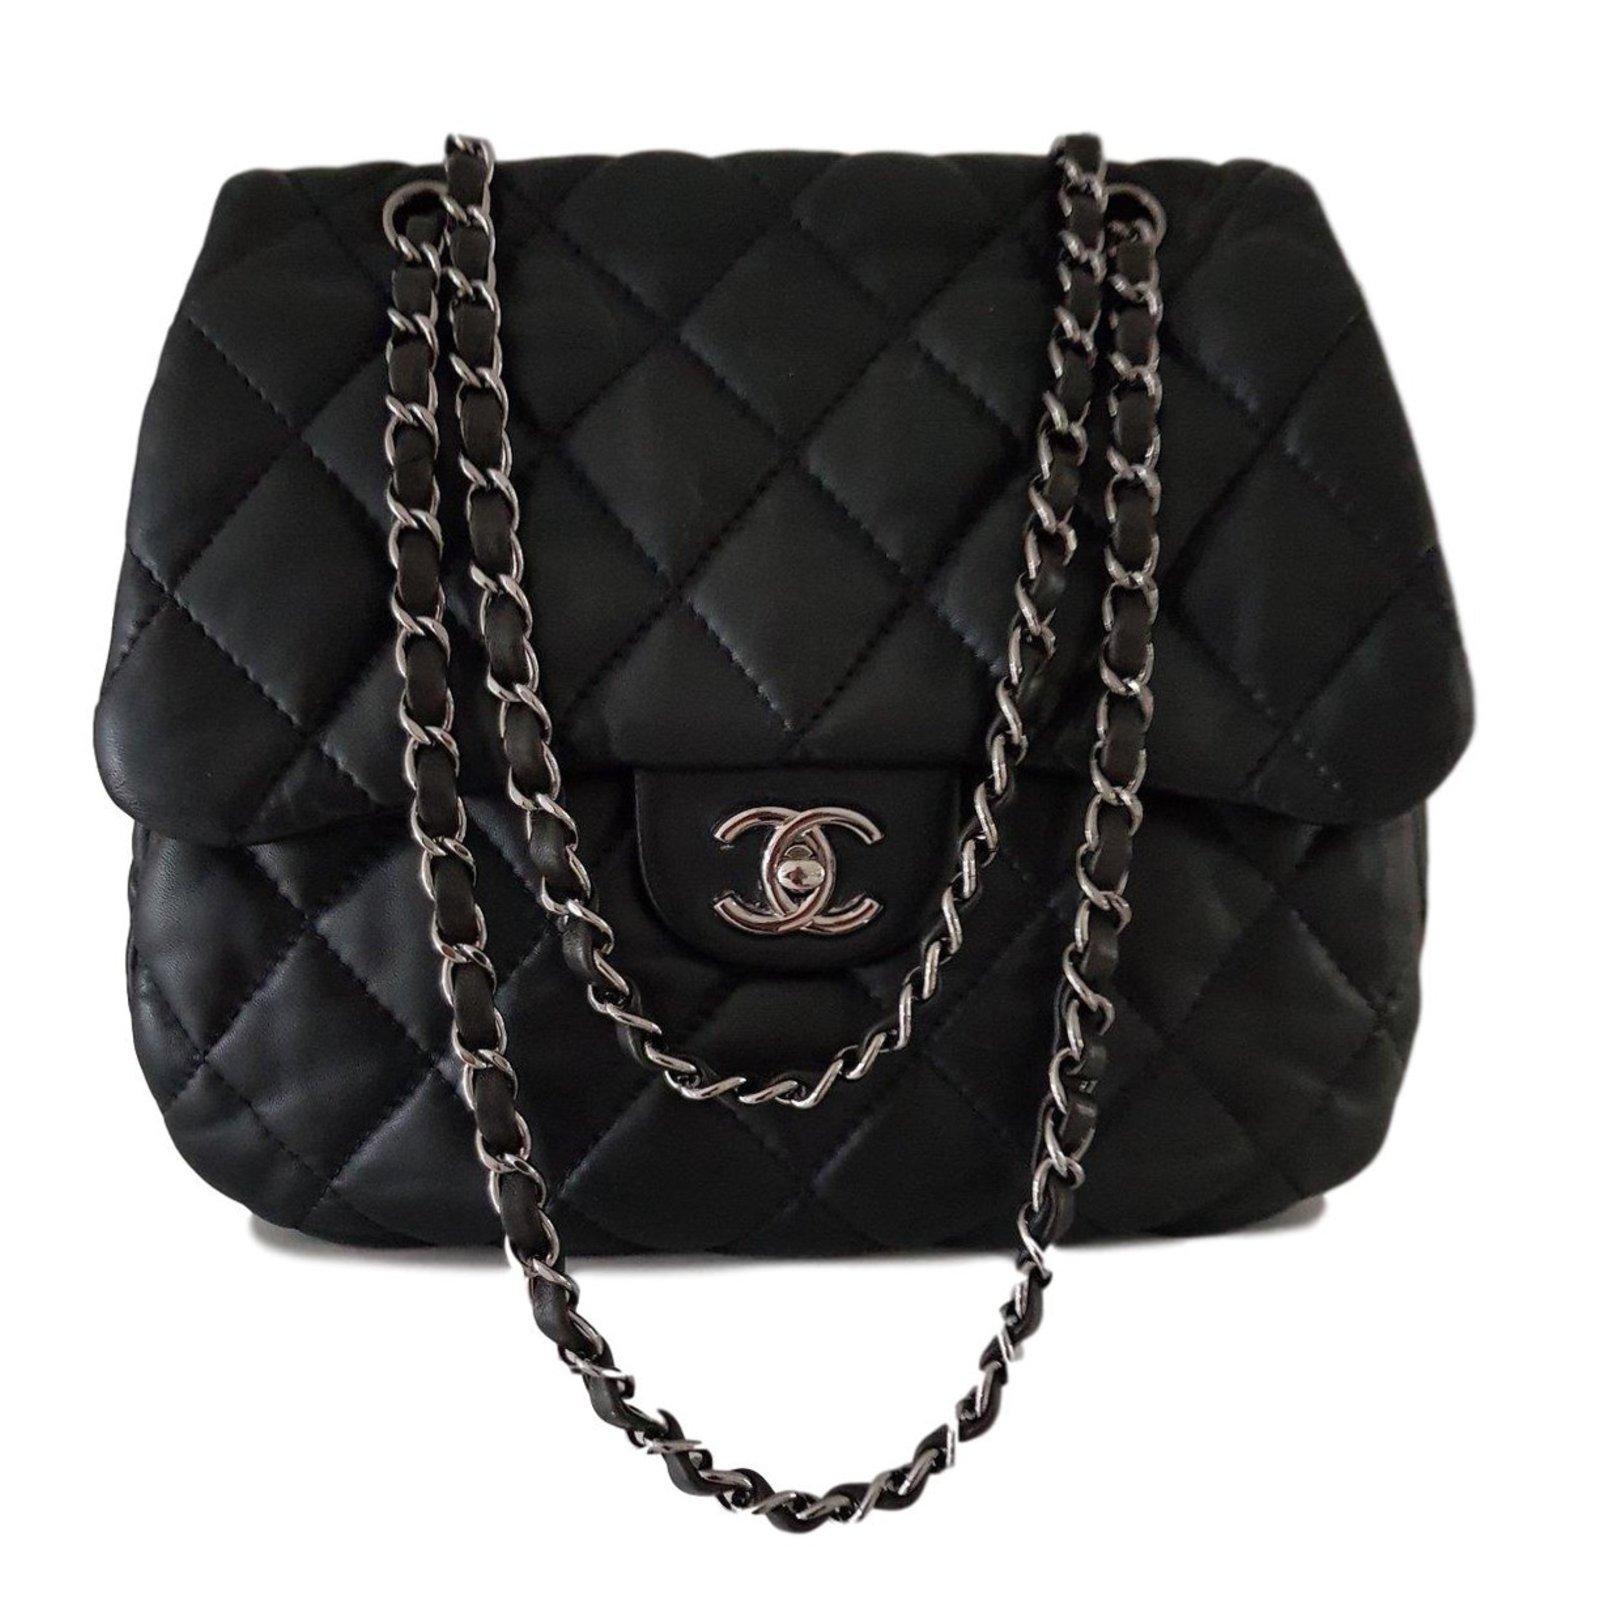 Sacs A Main Chanel Sac Matelasse Cuir Noir Ref 64395 Joli Closet